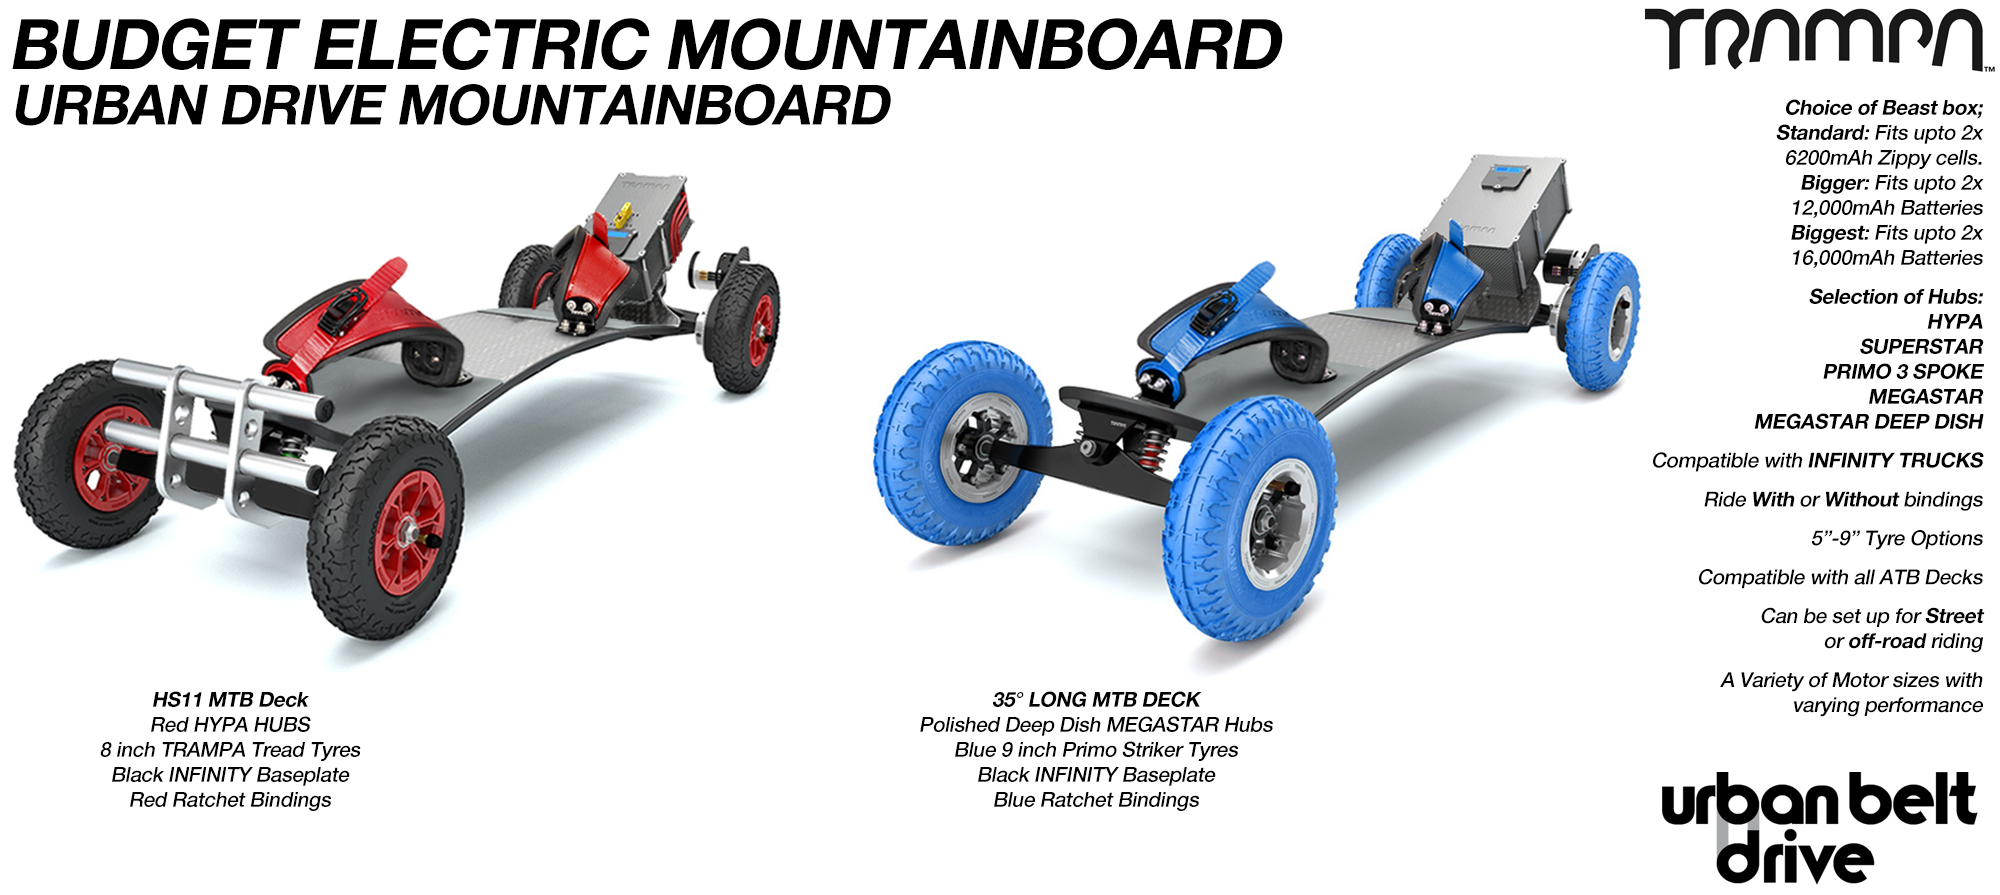 URBAN Electric Mountainboard - Urban Motor Mounts on custom TRAMPA deck ATB Trucks custom 8 inch Wheels Single VESC - NO Battery Box & NO BINDINGS